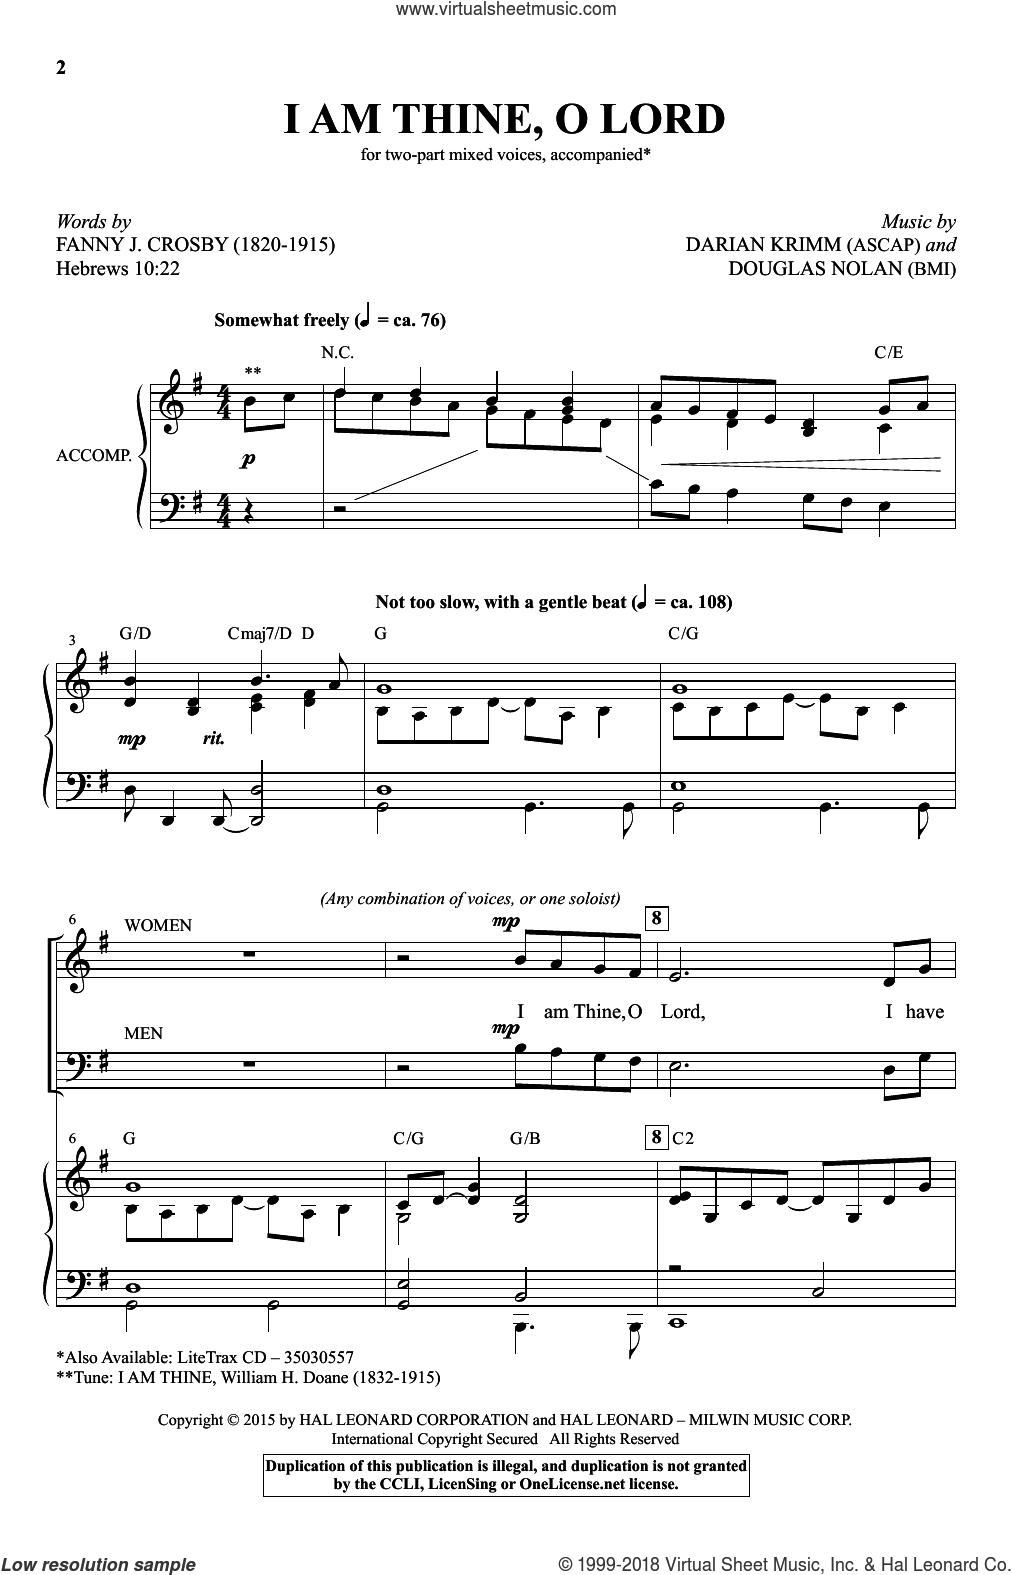 I Am Thine, O Lord sheet music for choir (2-Part) by Douglas Nolan, Darian Krimm and Fanny J. Crosby, intermediate duet